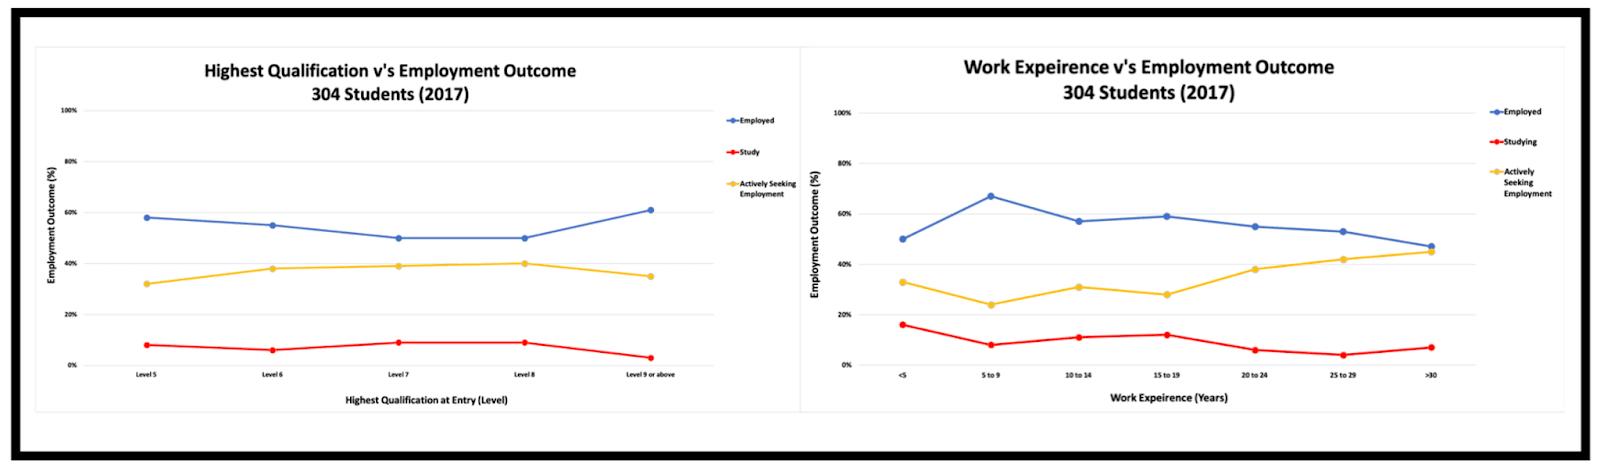 Analysis of Employment Outcome